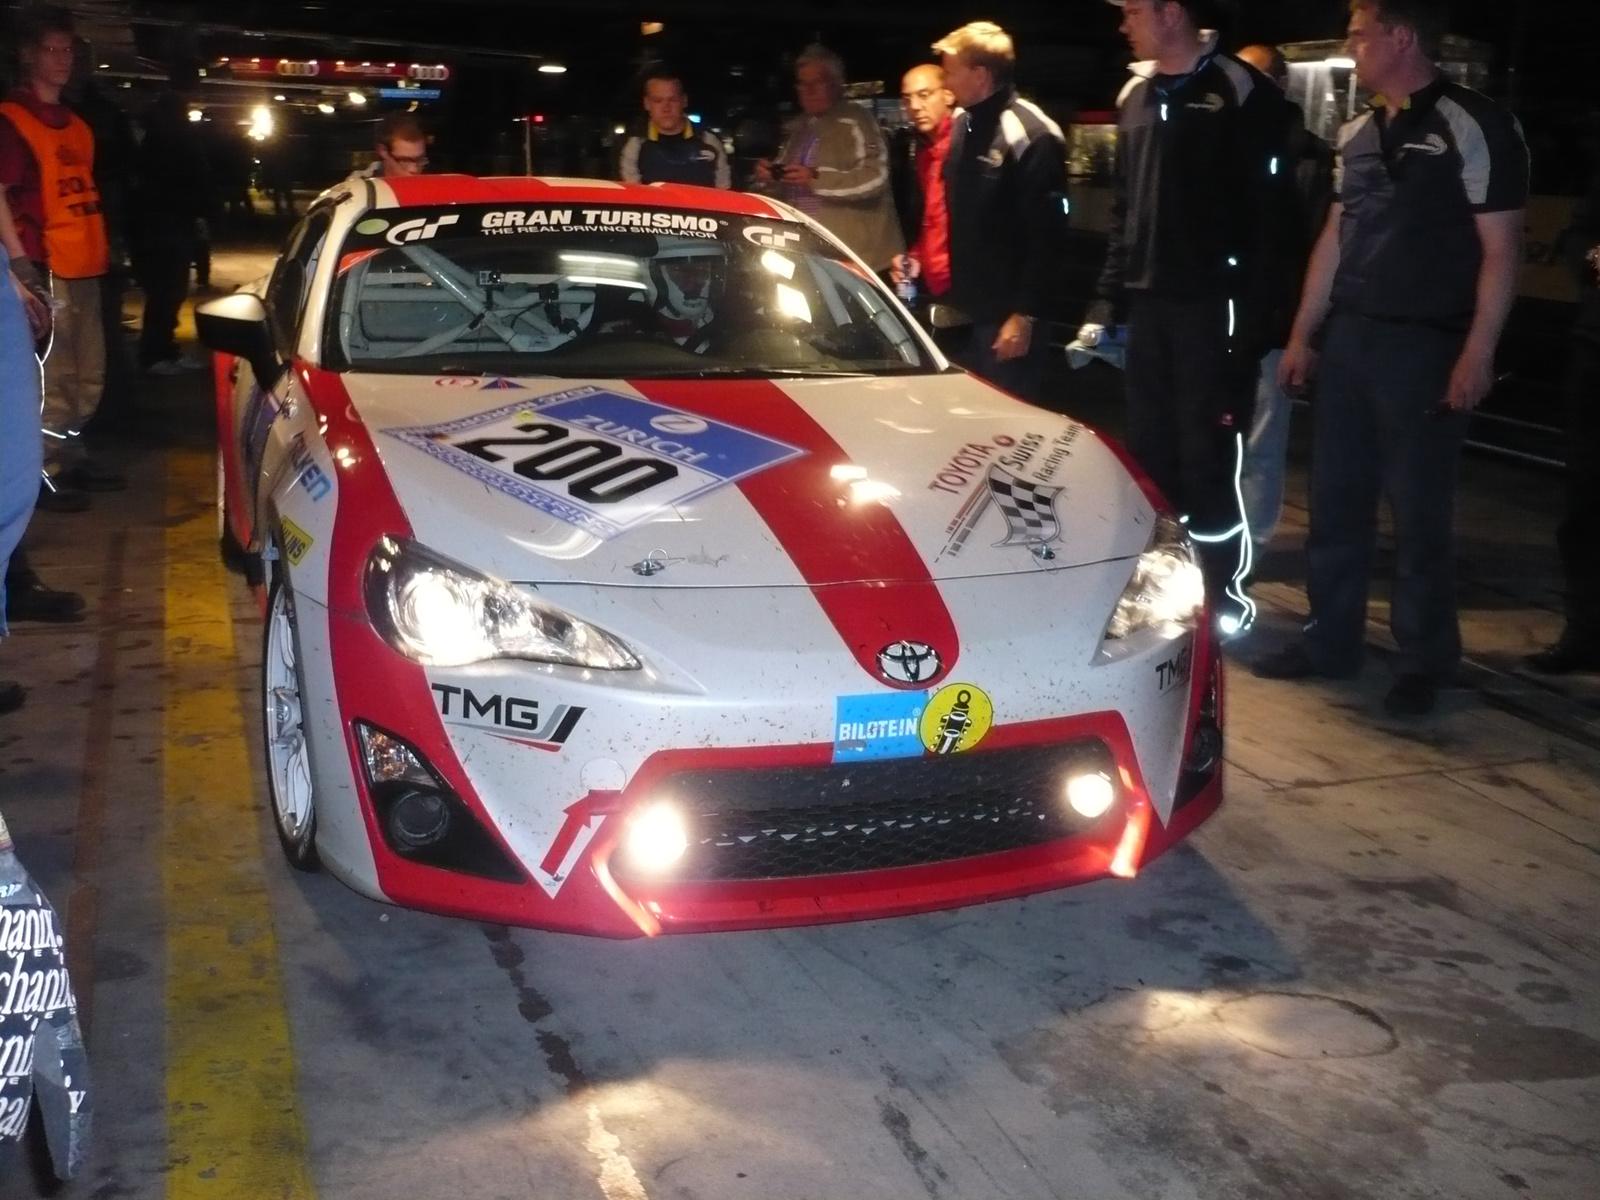 Toyota 86 swiss racing team gt86 front